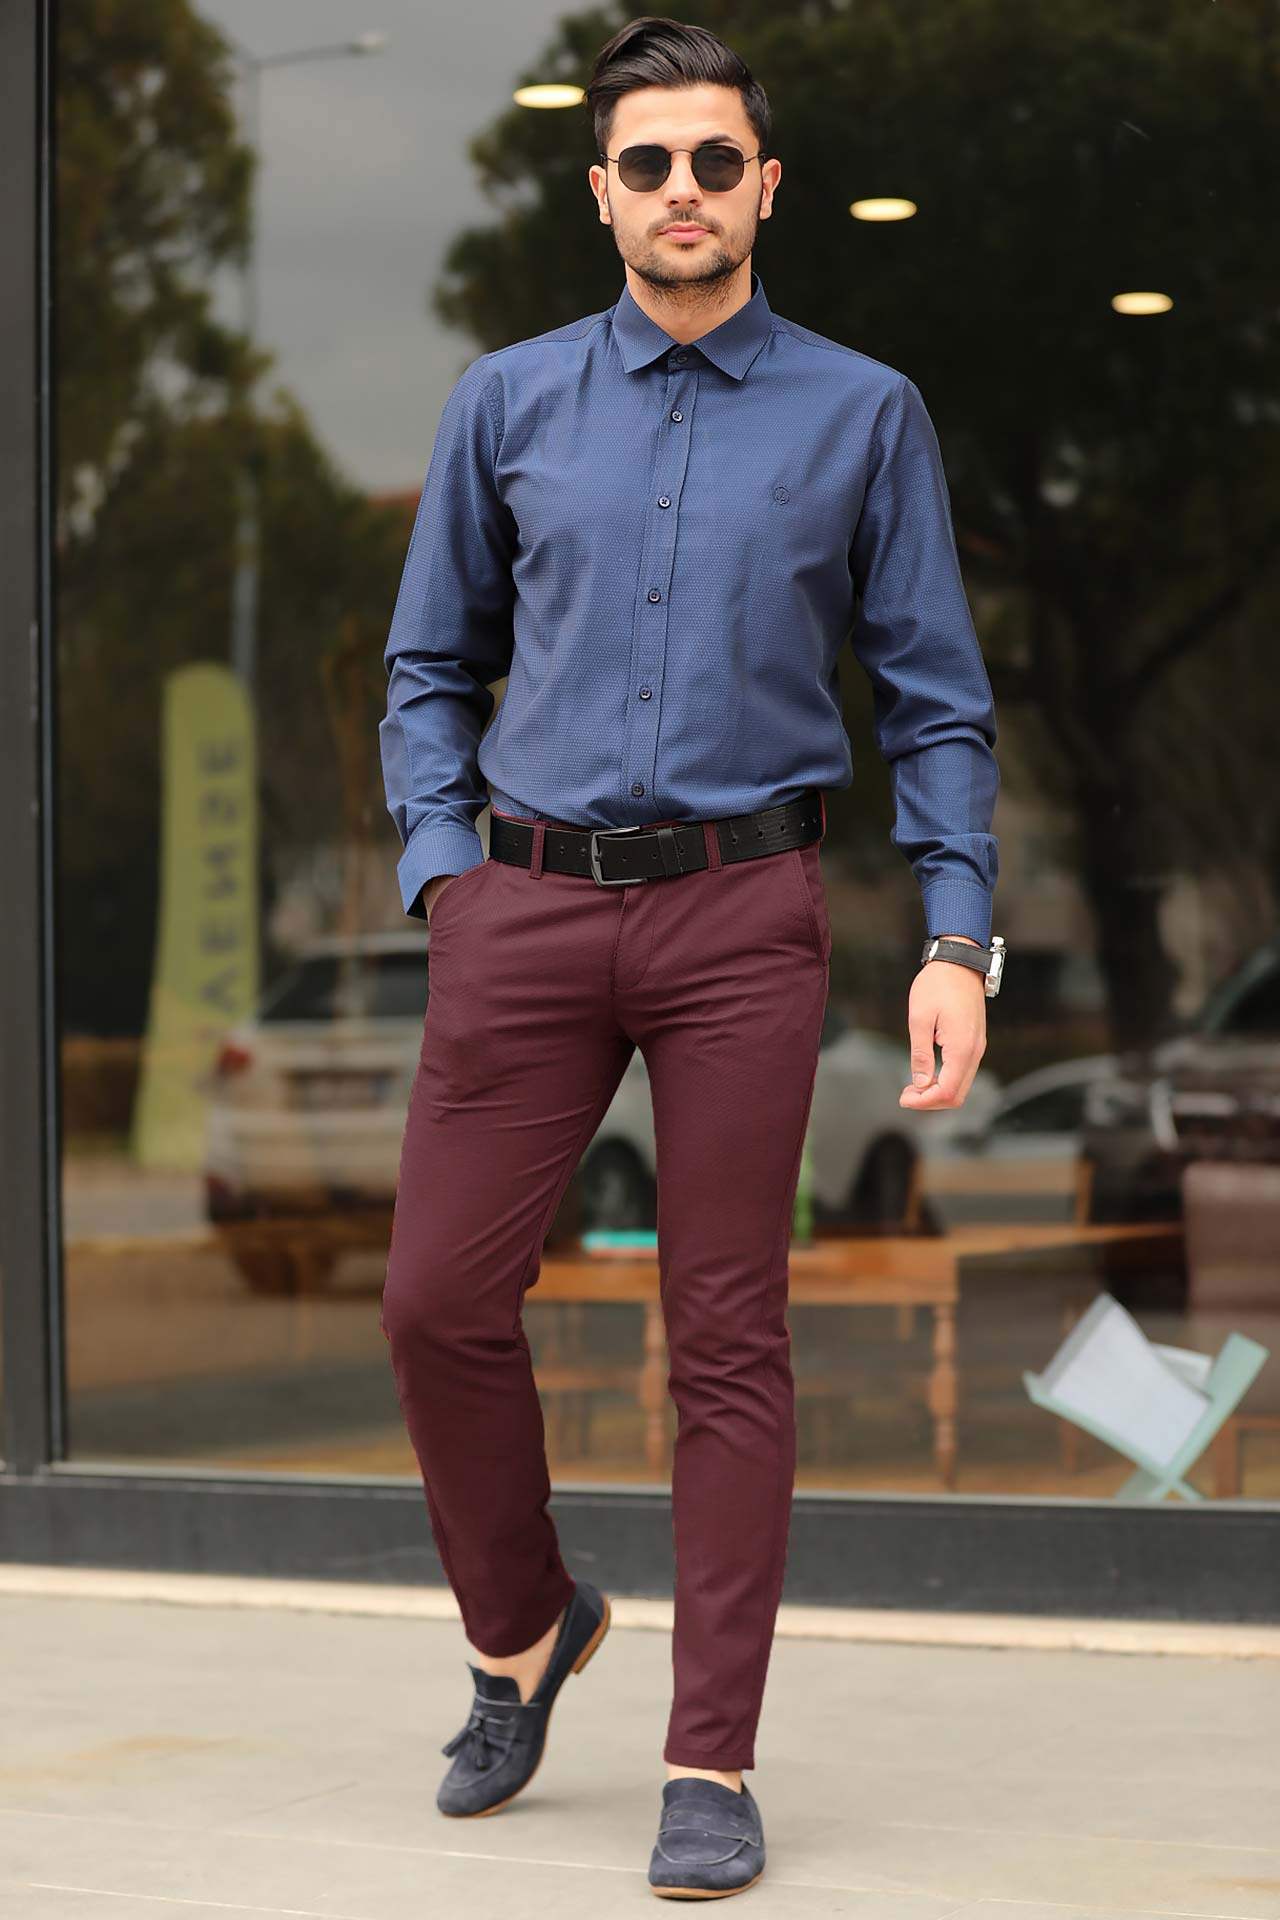 Men's Pocketed Claret Red Pants